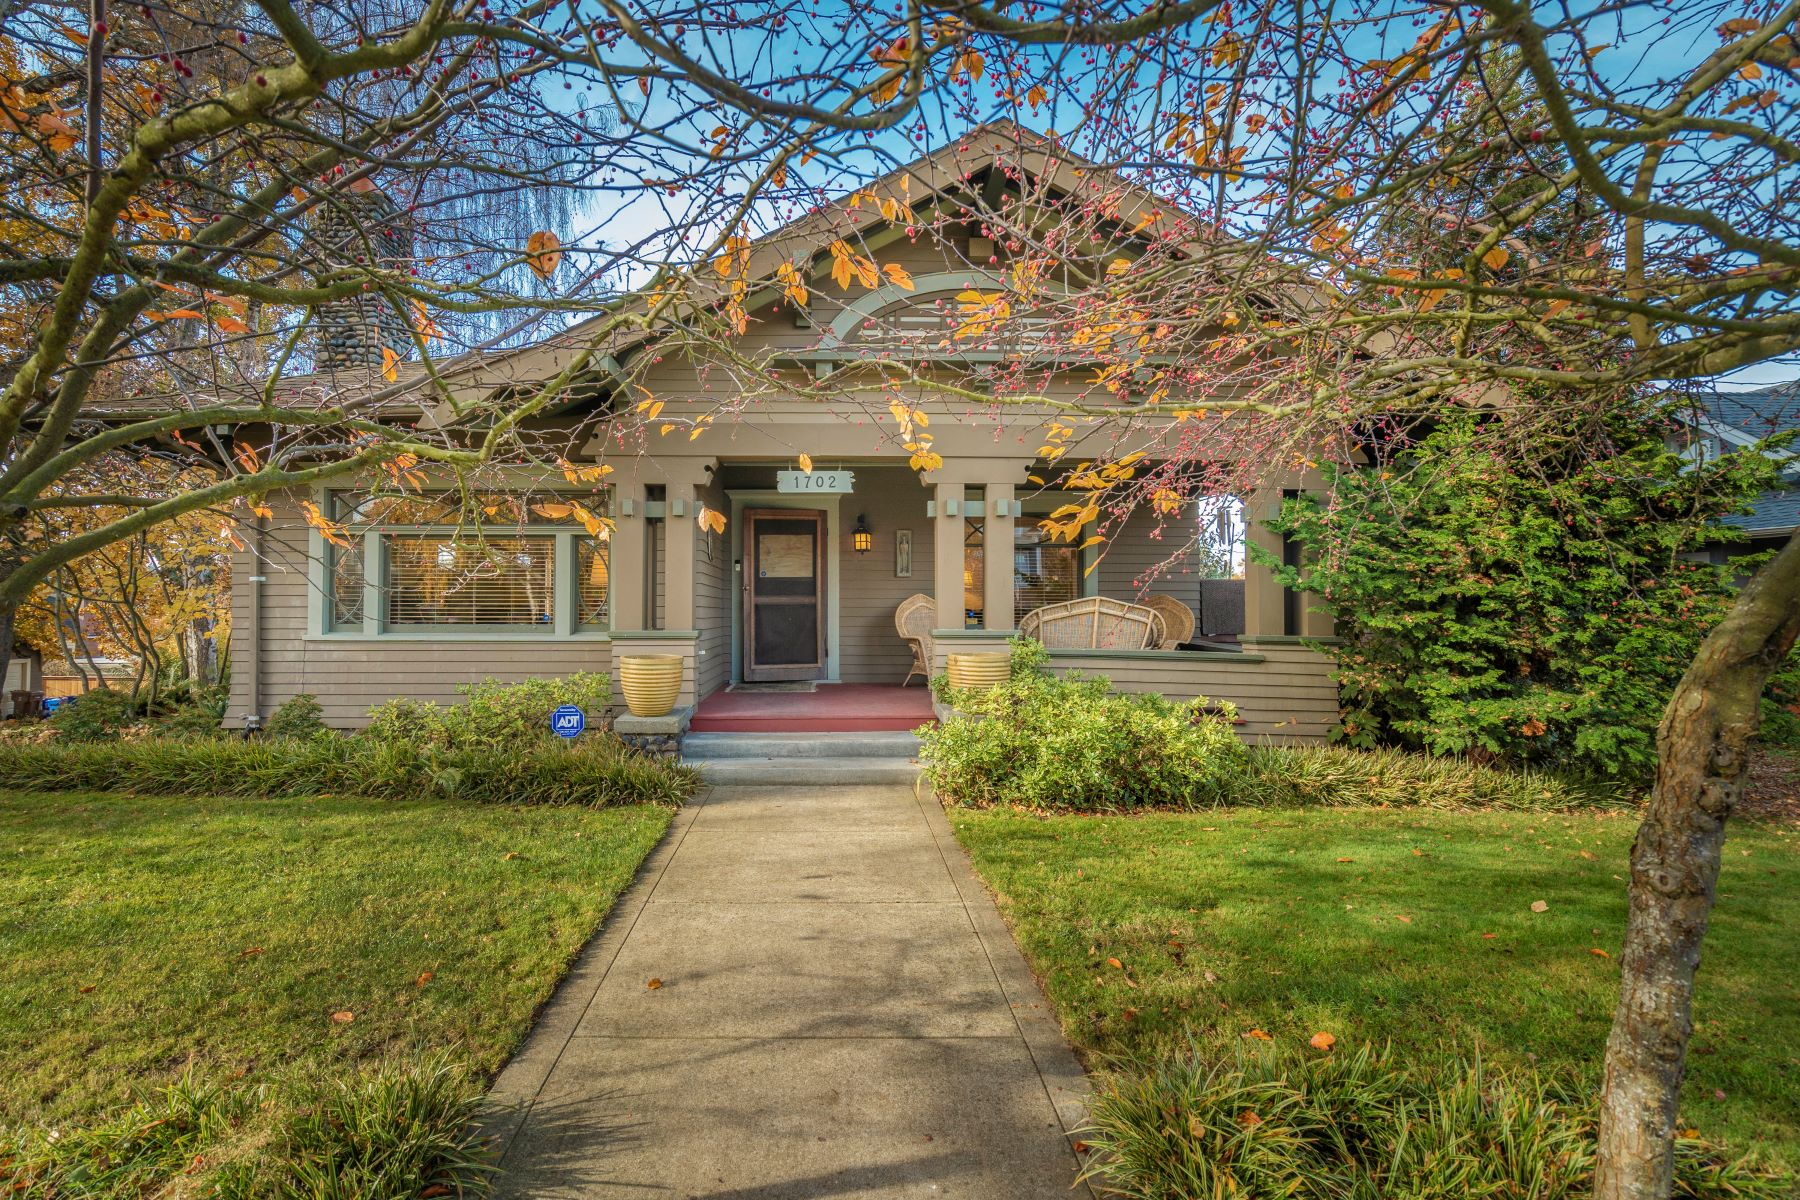 Single Family Homes for Sale at 1702NProspect.com 1702 North Prospect Street Tacoma, Washington 98406 United States